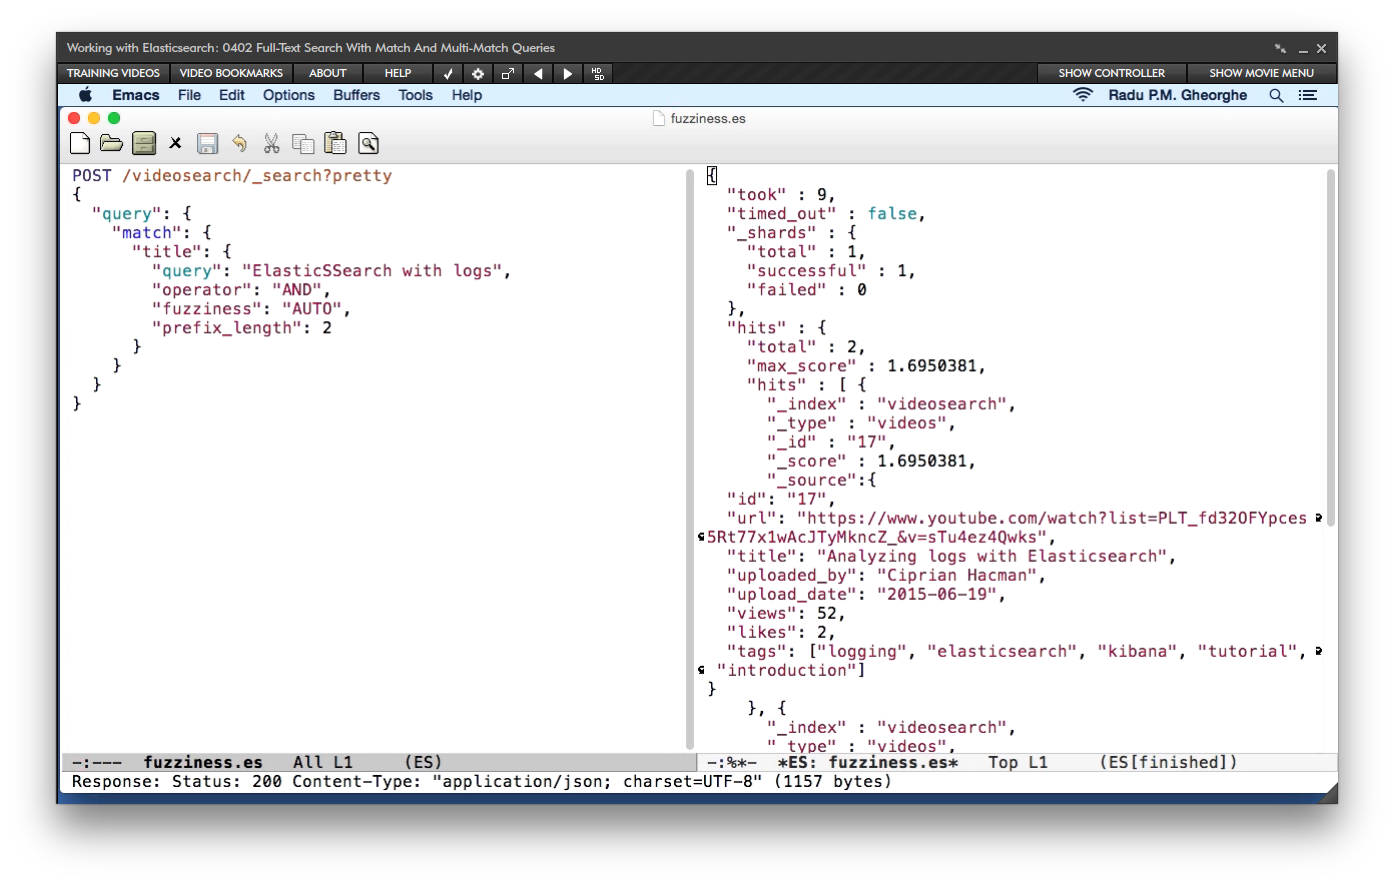 Amazon com: Working with Elasticsearch [Online Code]: Software